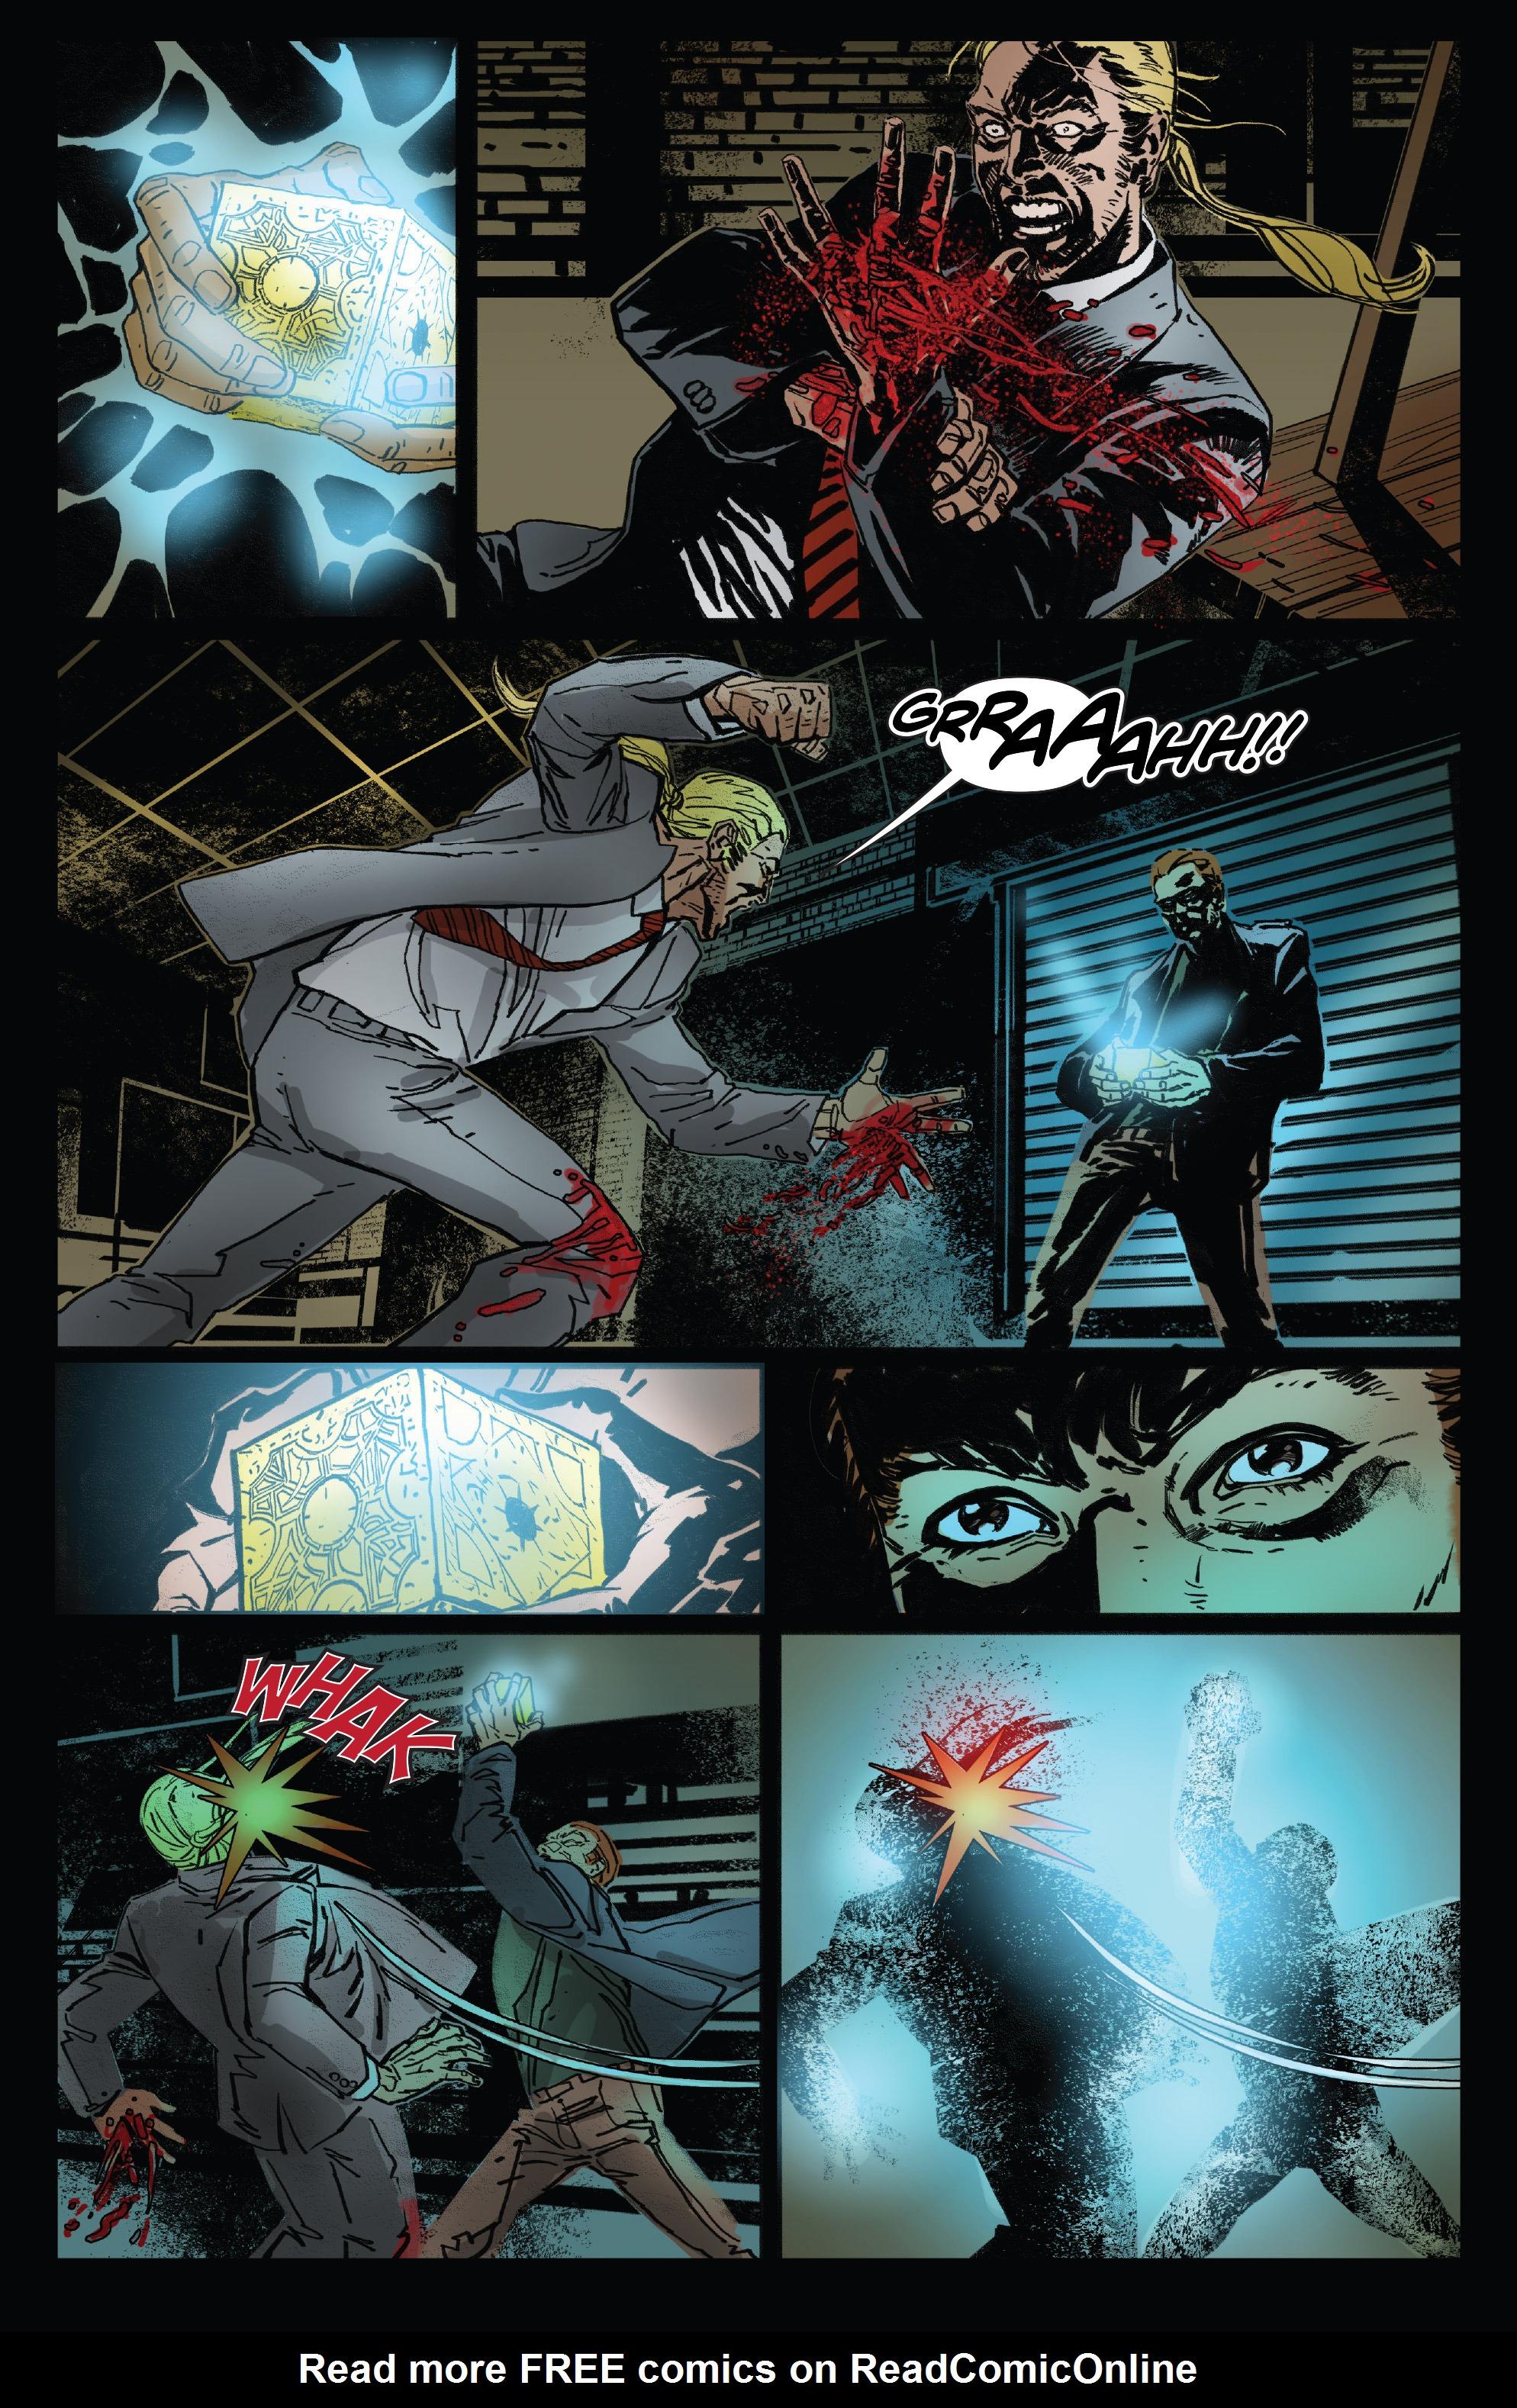 Read online Clive Barker's Hellraiser: The Dark Watch comic -  Issue # TPB 3 - 22